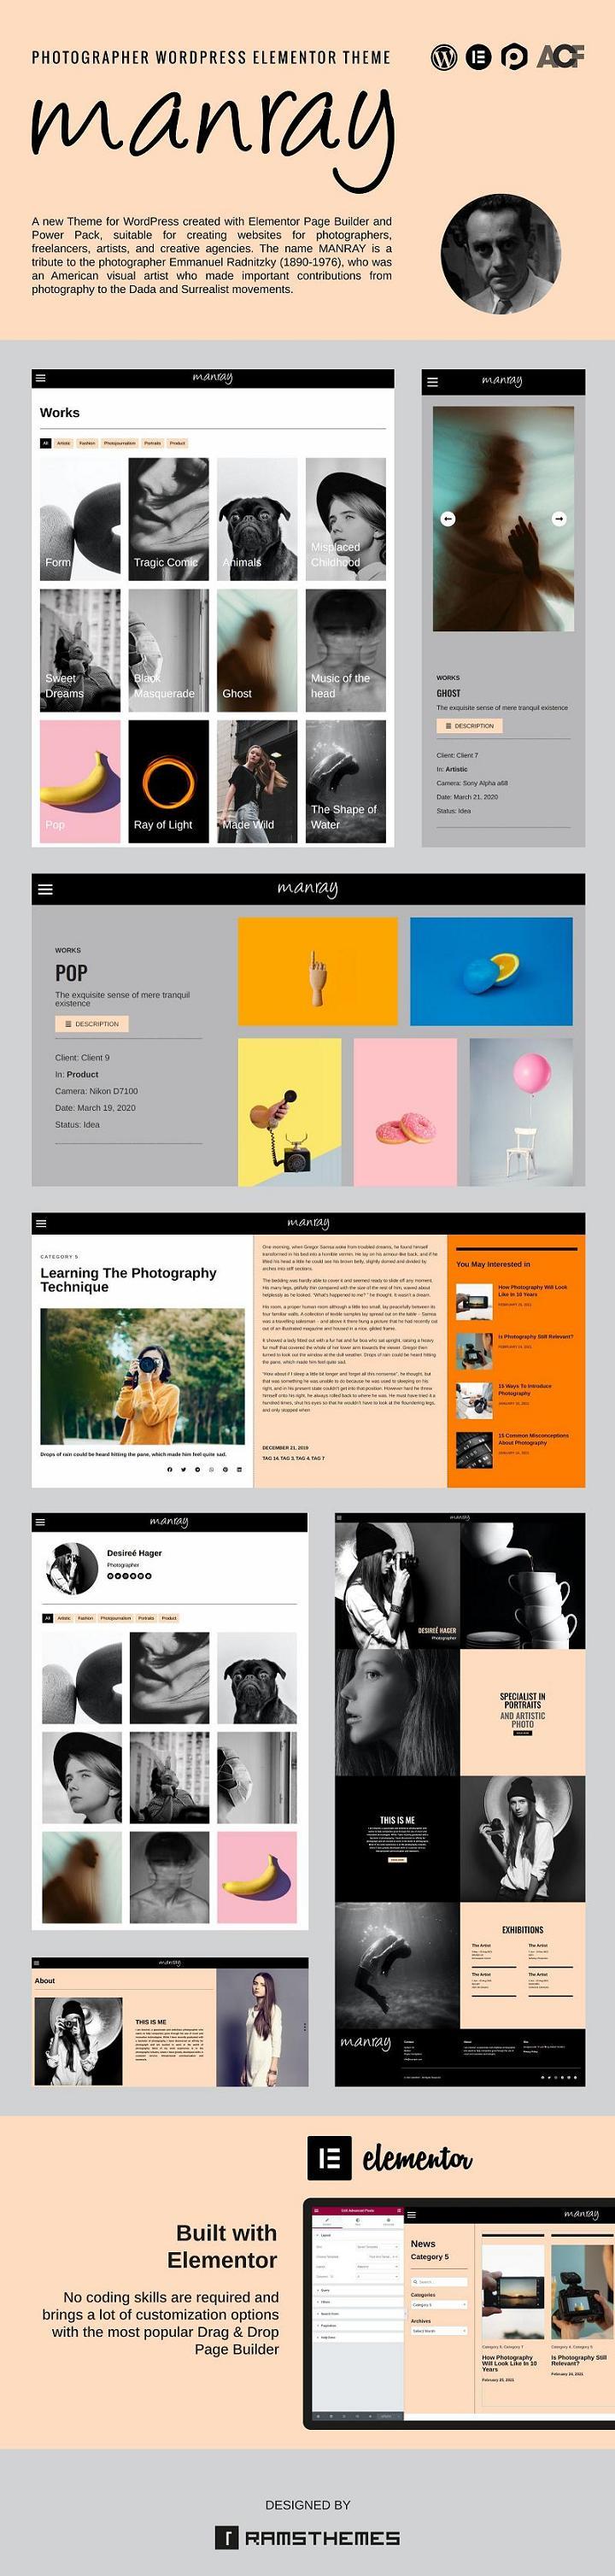 MANRAY WordPress theme